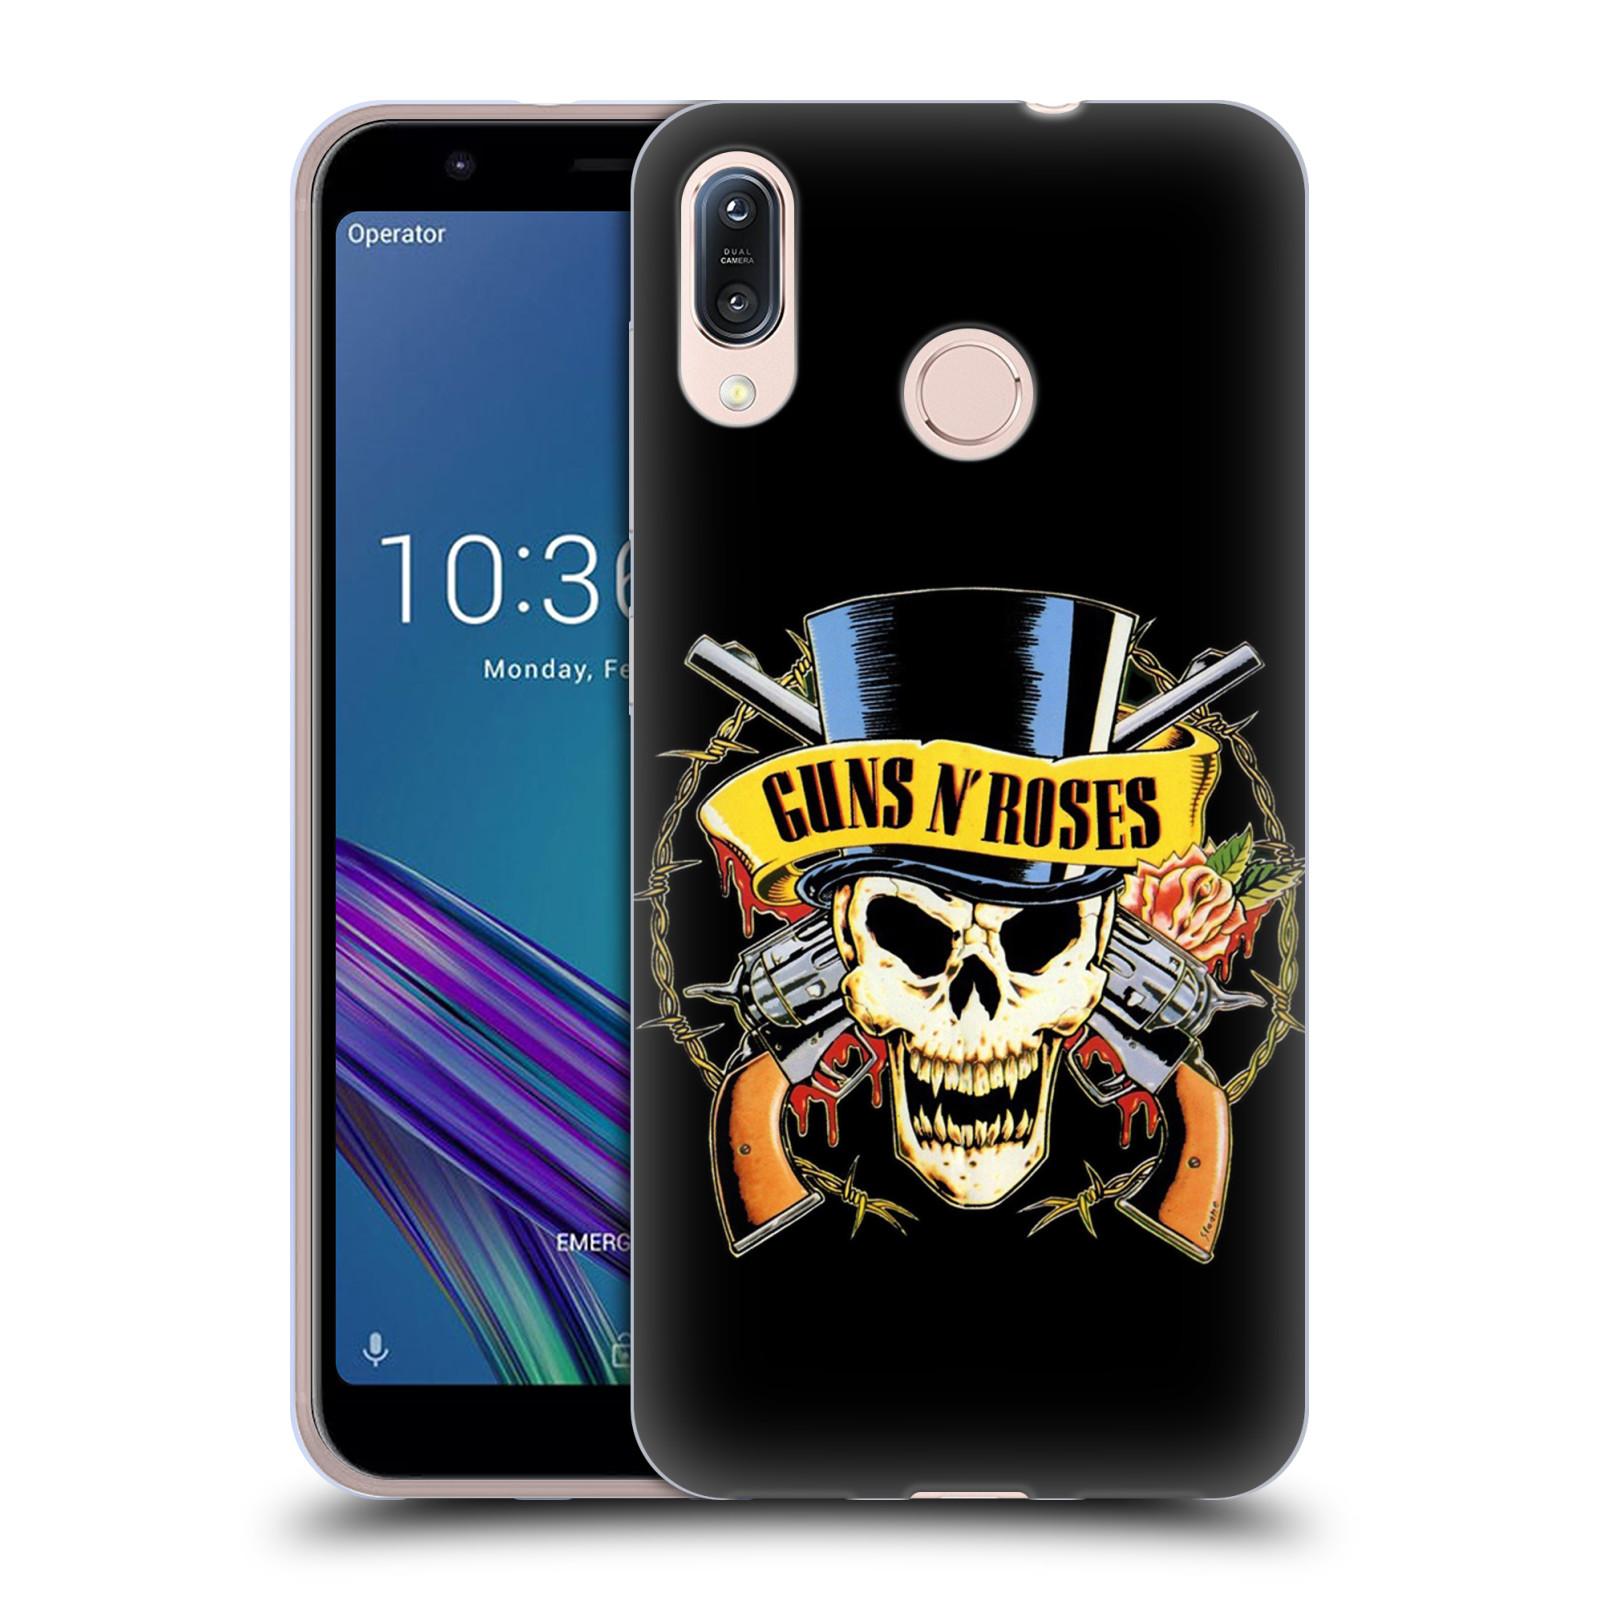 Silikonové pouzdro na mobil Asus Zenfone Max M1 ZB555KL - Head Case - Guns N' Roses - Lebka